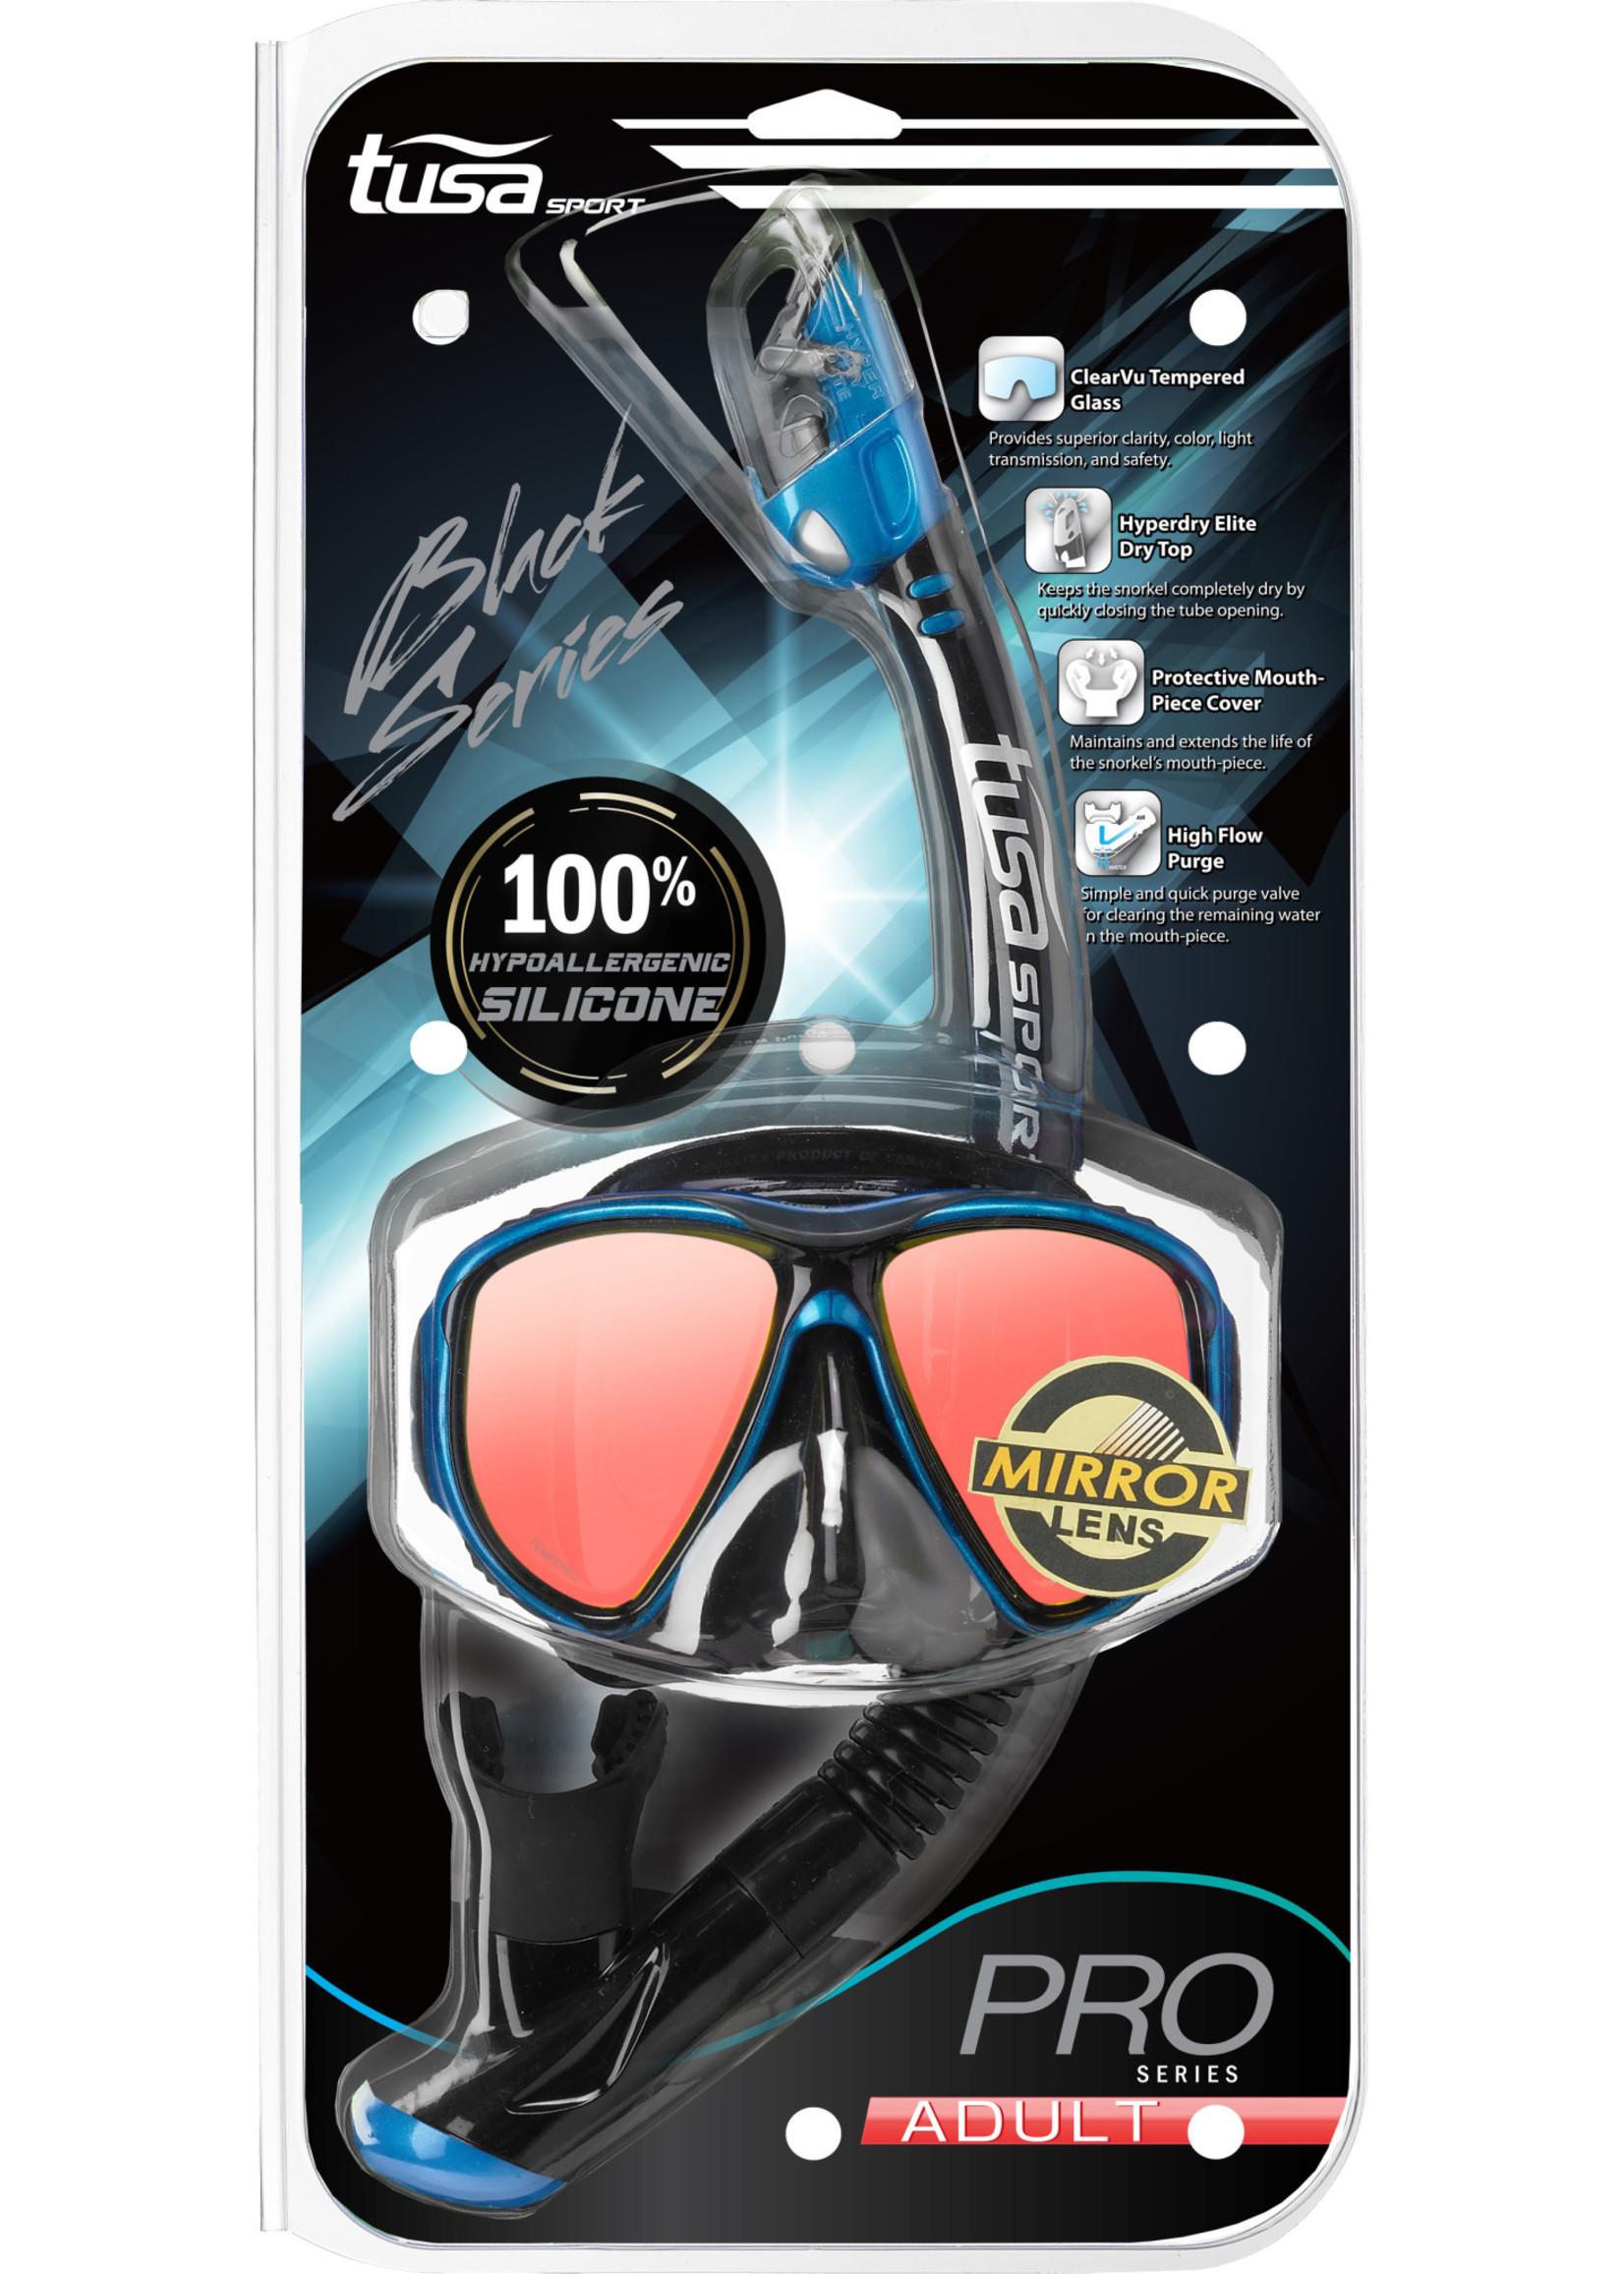 TUSA TUSA Powerview Adult Dry Combo (Mirror Lens) - Black/Fishtail Blue